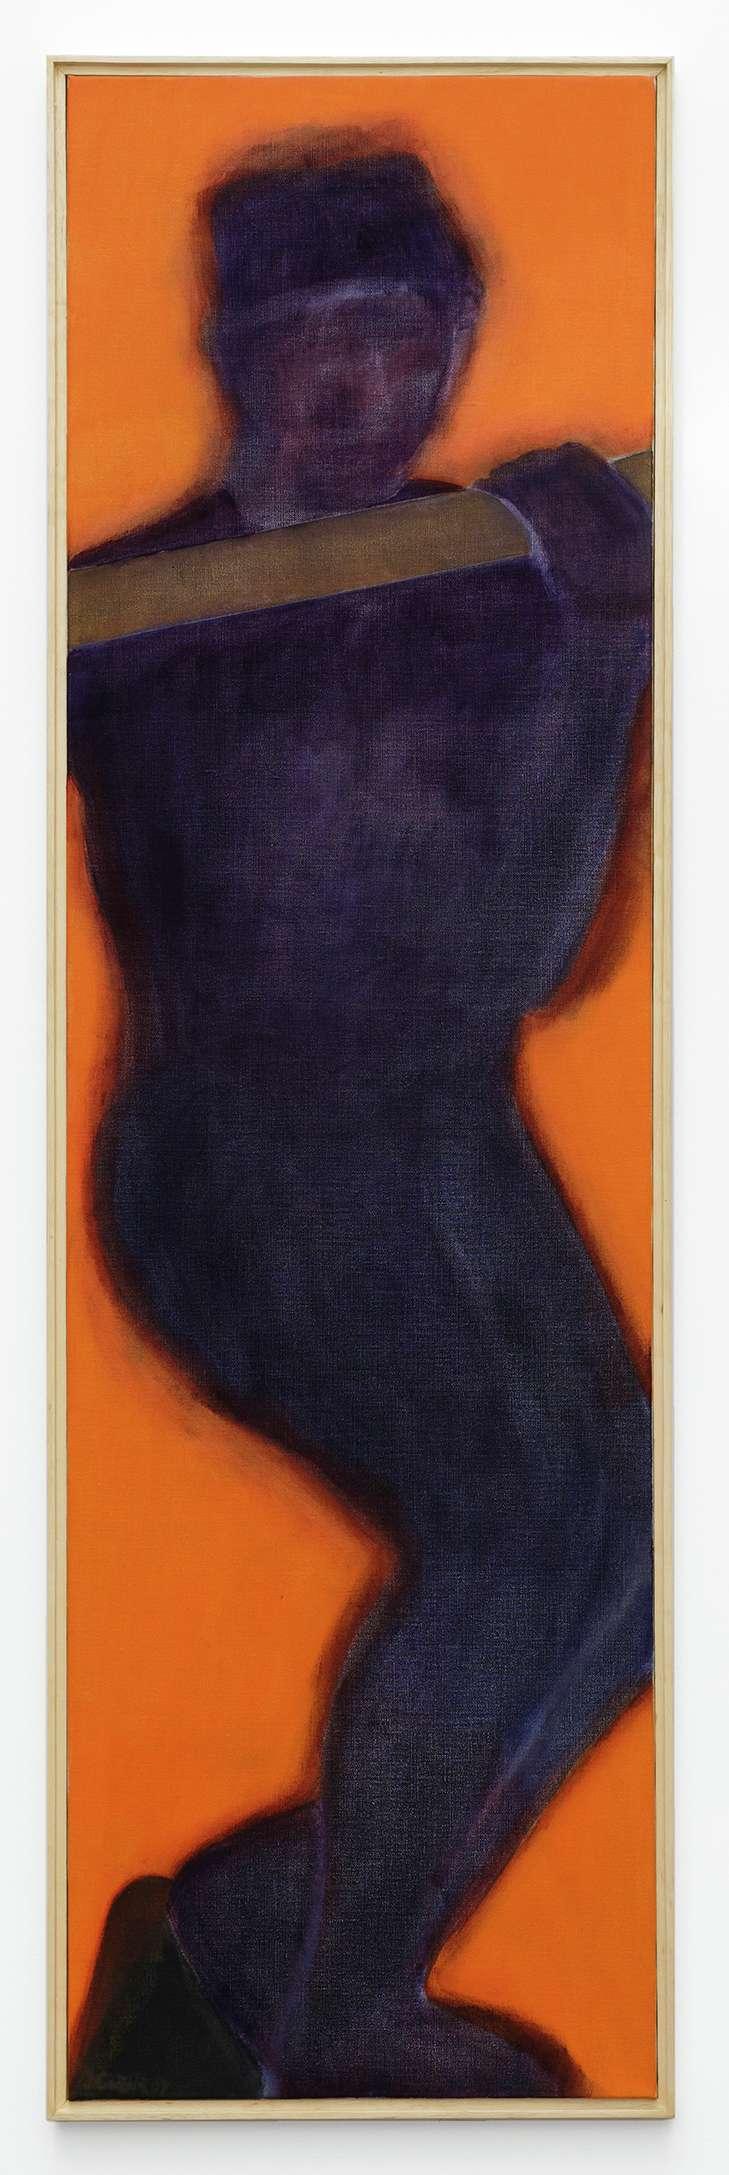 Beatriz González, 500 NN, 2007 Huile sur toile155 × 45 cm / 61  × 17 6/8 in.158 × 48 cm / 62 2/8 × 18 7/8 in. (encadré/framed)